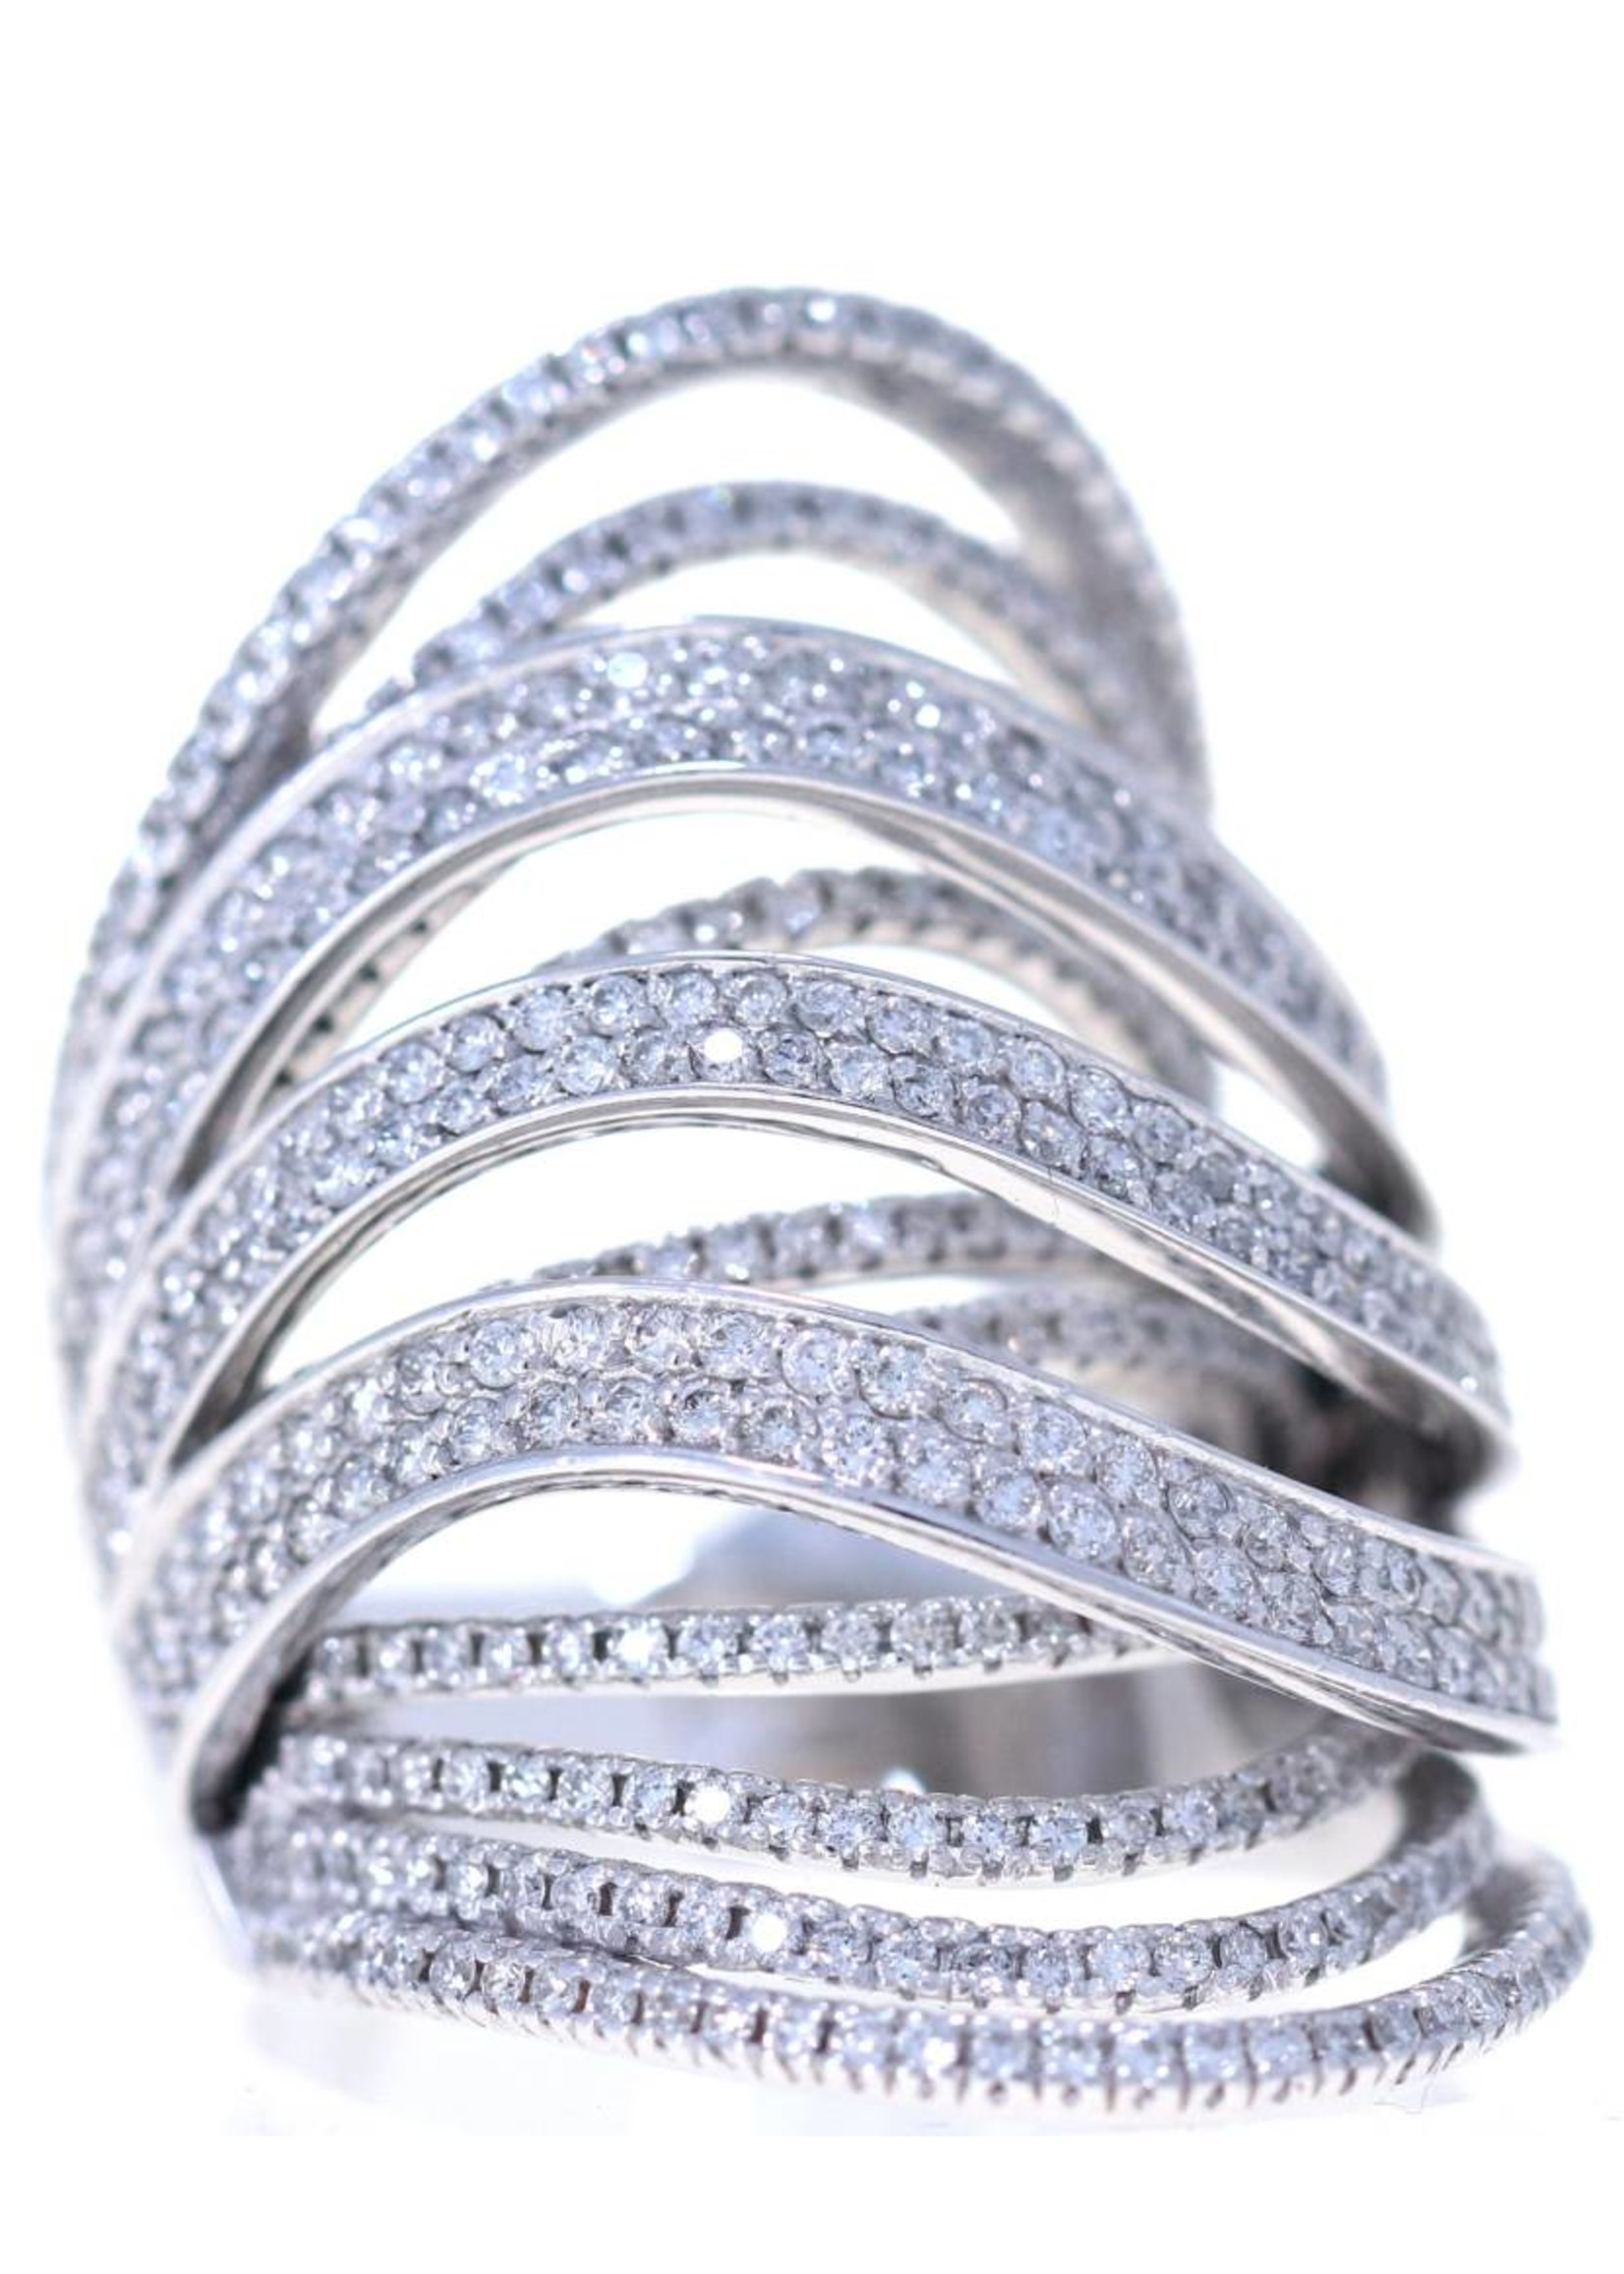 Jewellery LADYS WHITE GOLD FANCY DESIGN DIAMOND RING